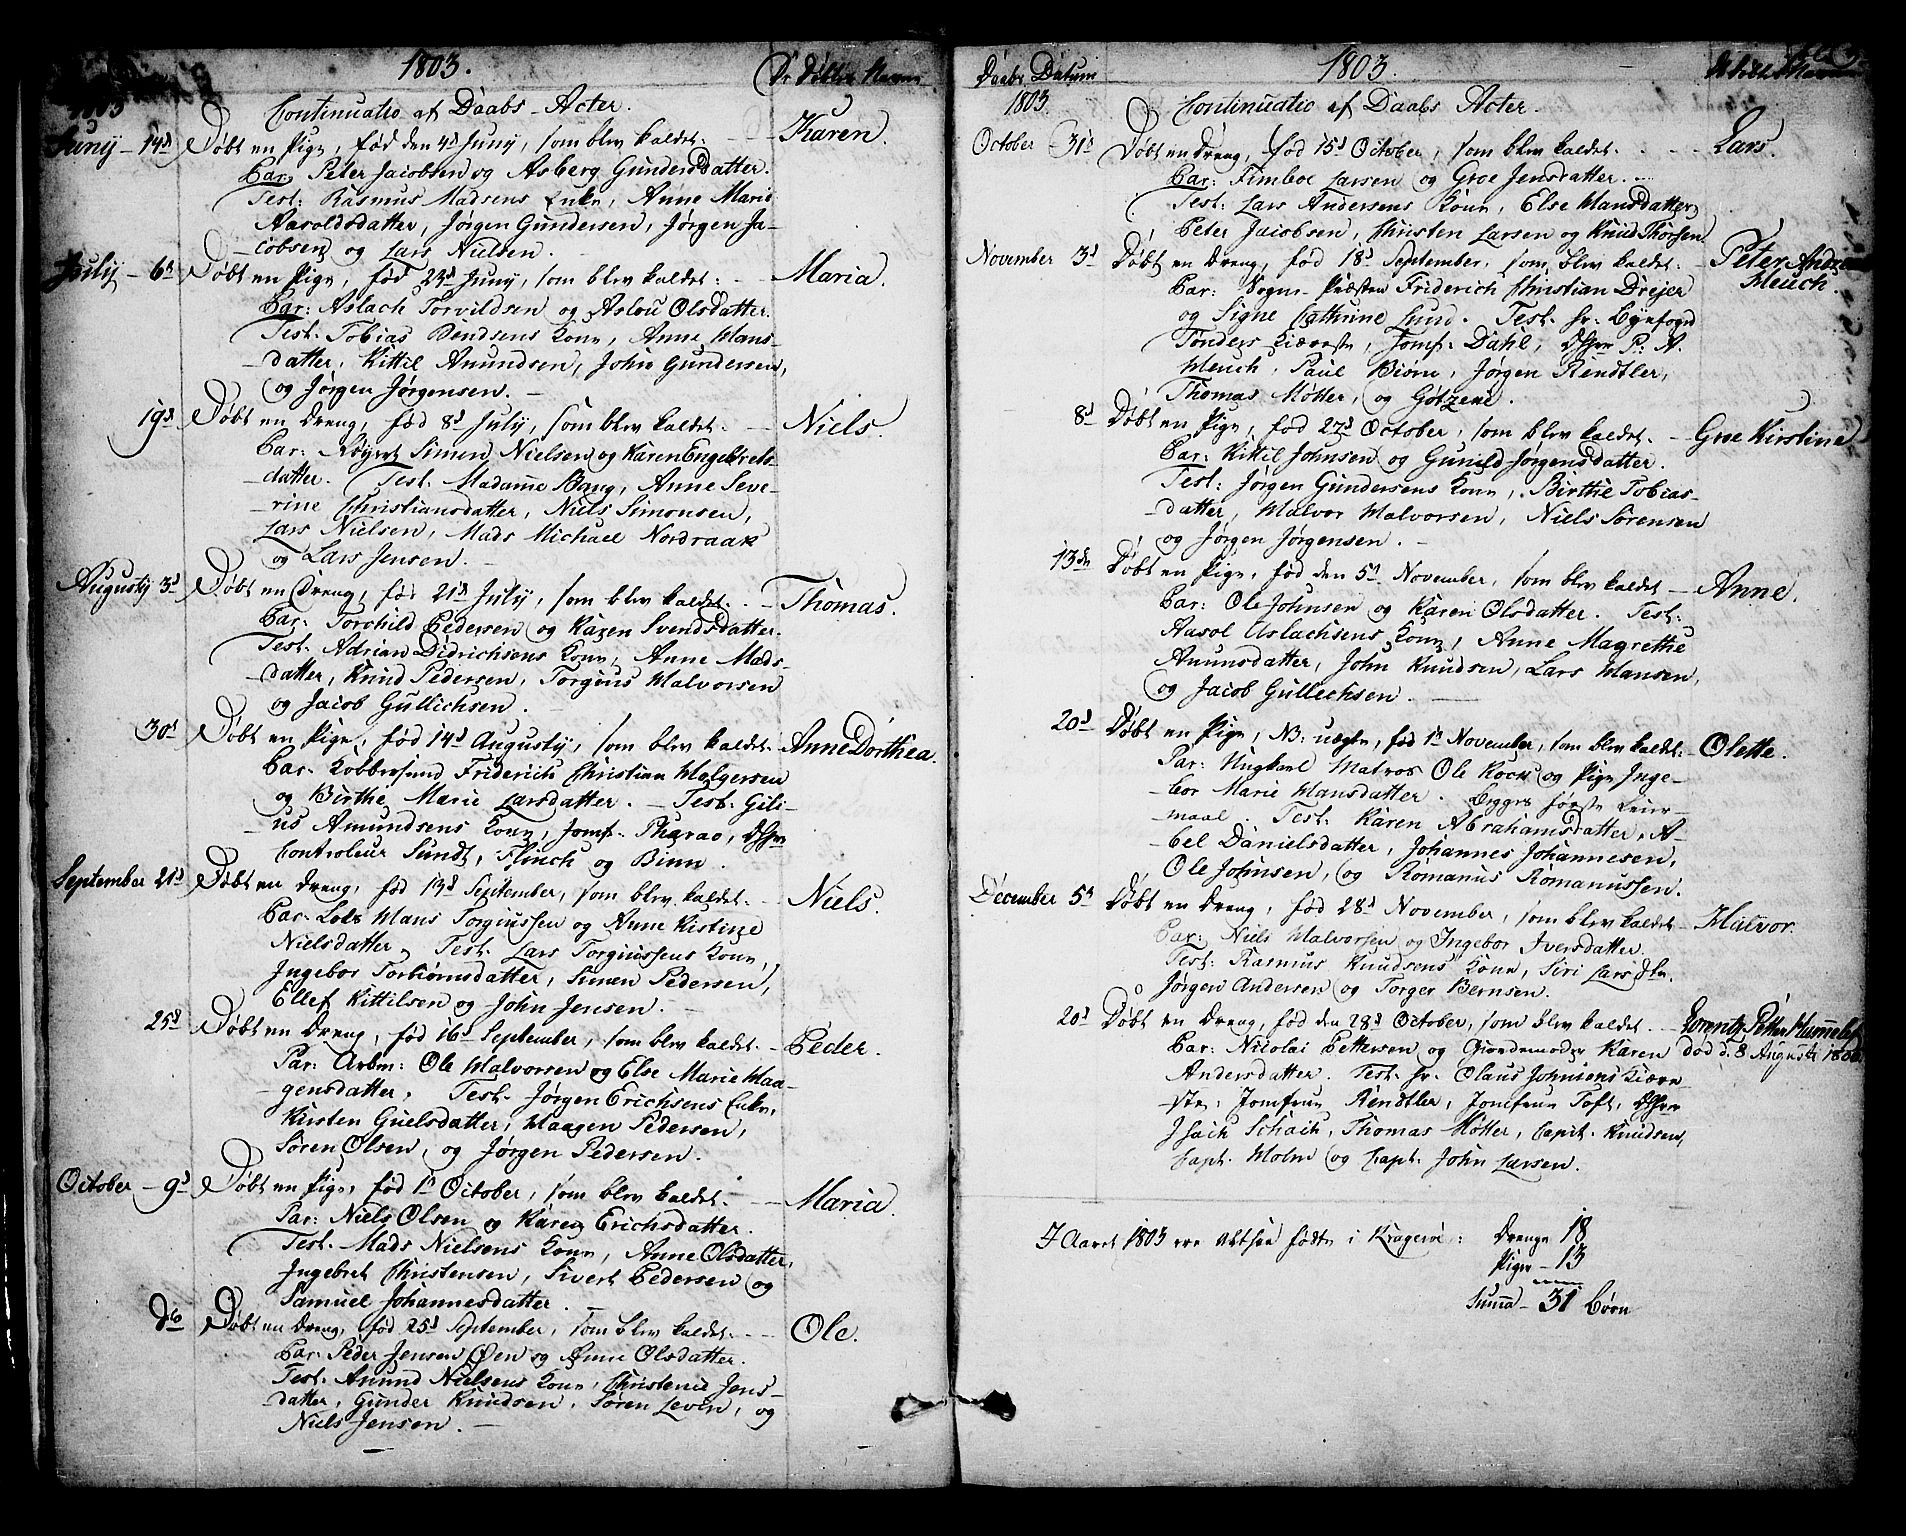 SAKO, Kragerø kirkebøker, F/Fa/L0003: Ministerialbok nr. 3, 1802-1813, s. 3